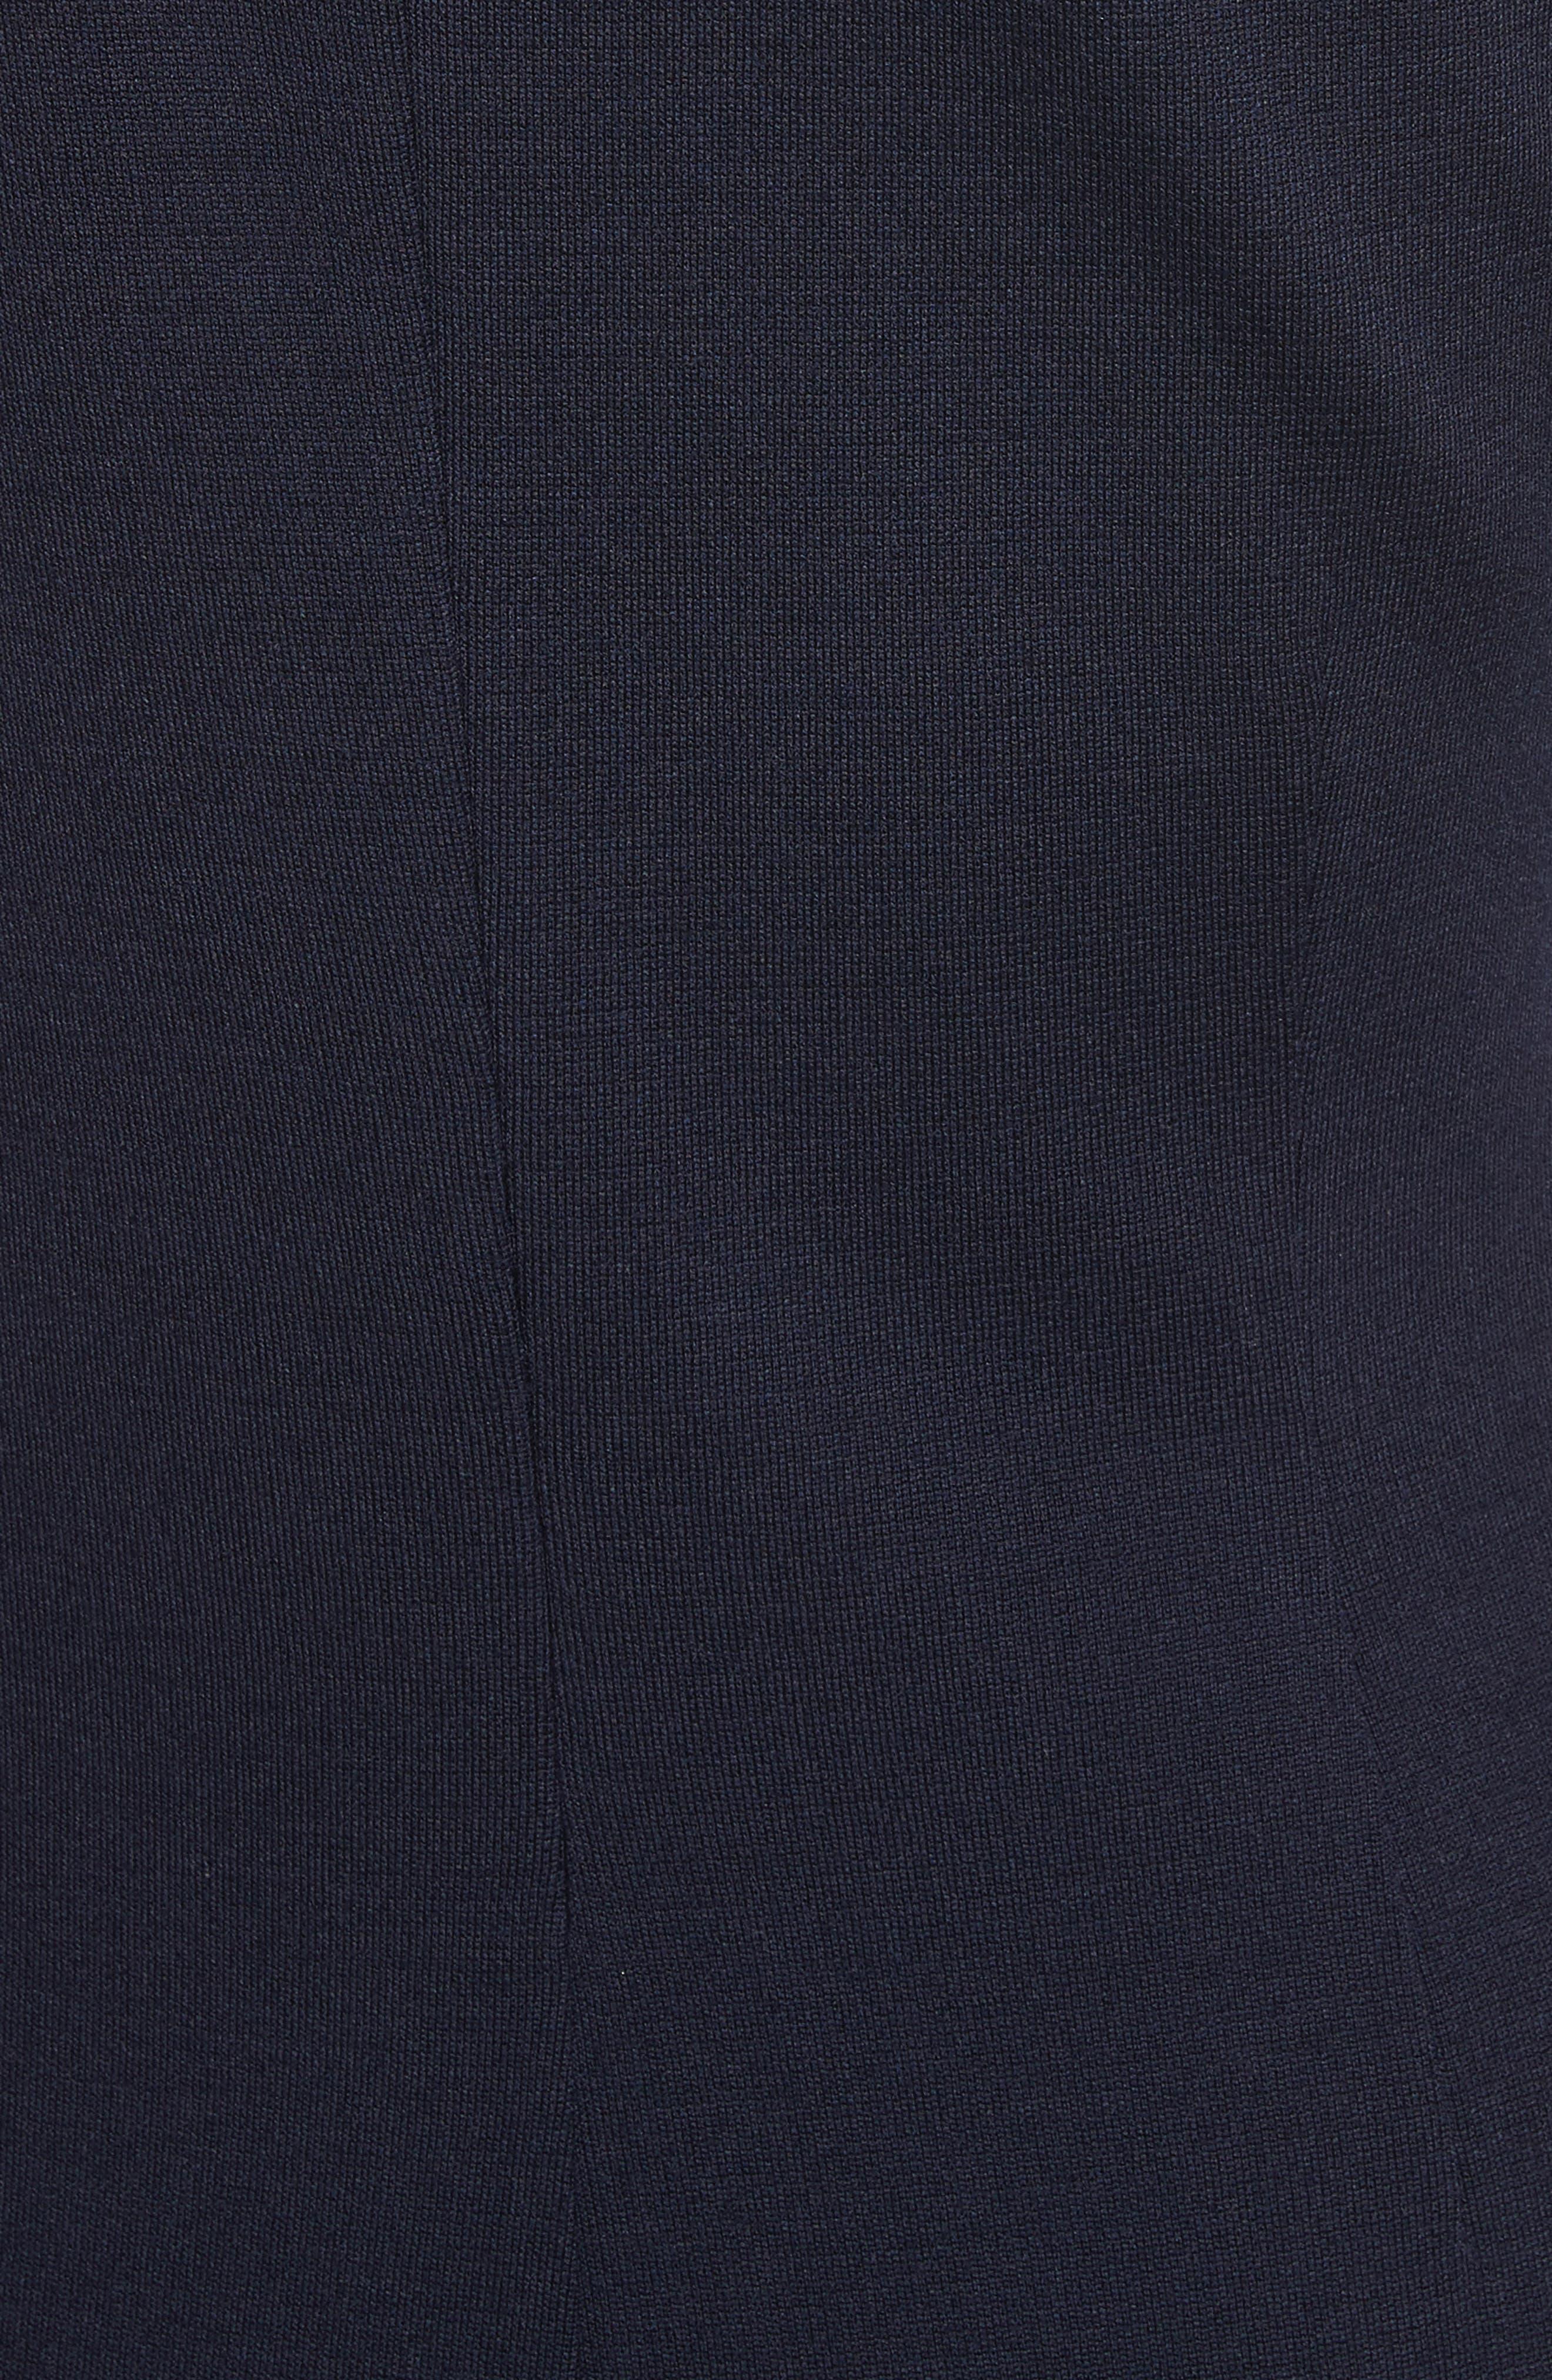 Milano Knit A-Line Dress,                             Alternate thumbnail 5, color,                             410